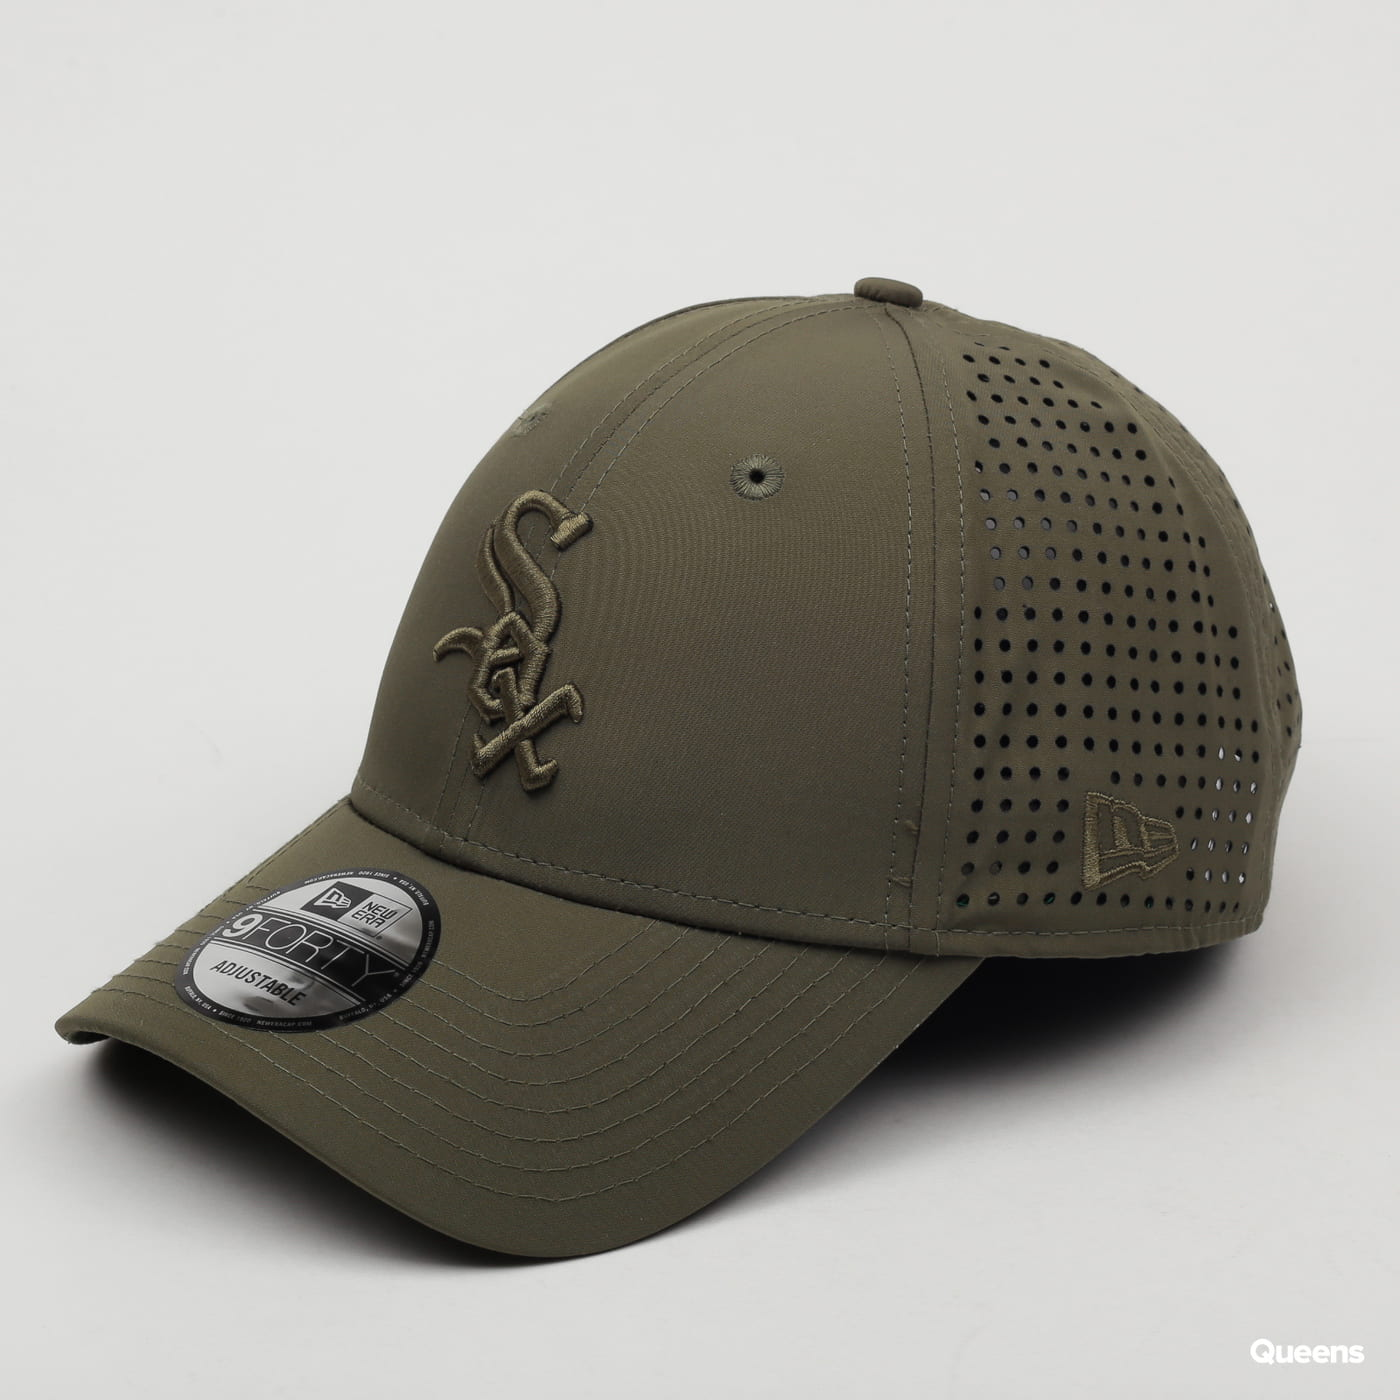 New Era 940 MLB Feather Perf Sox olive